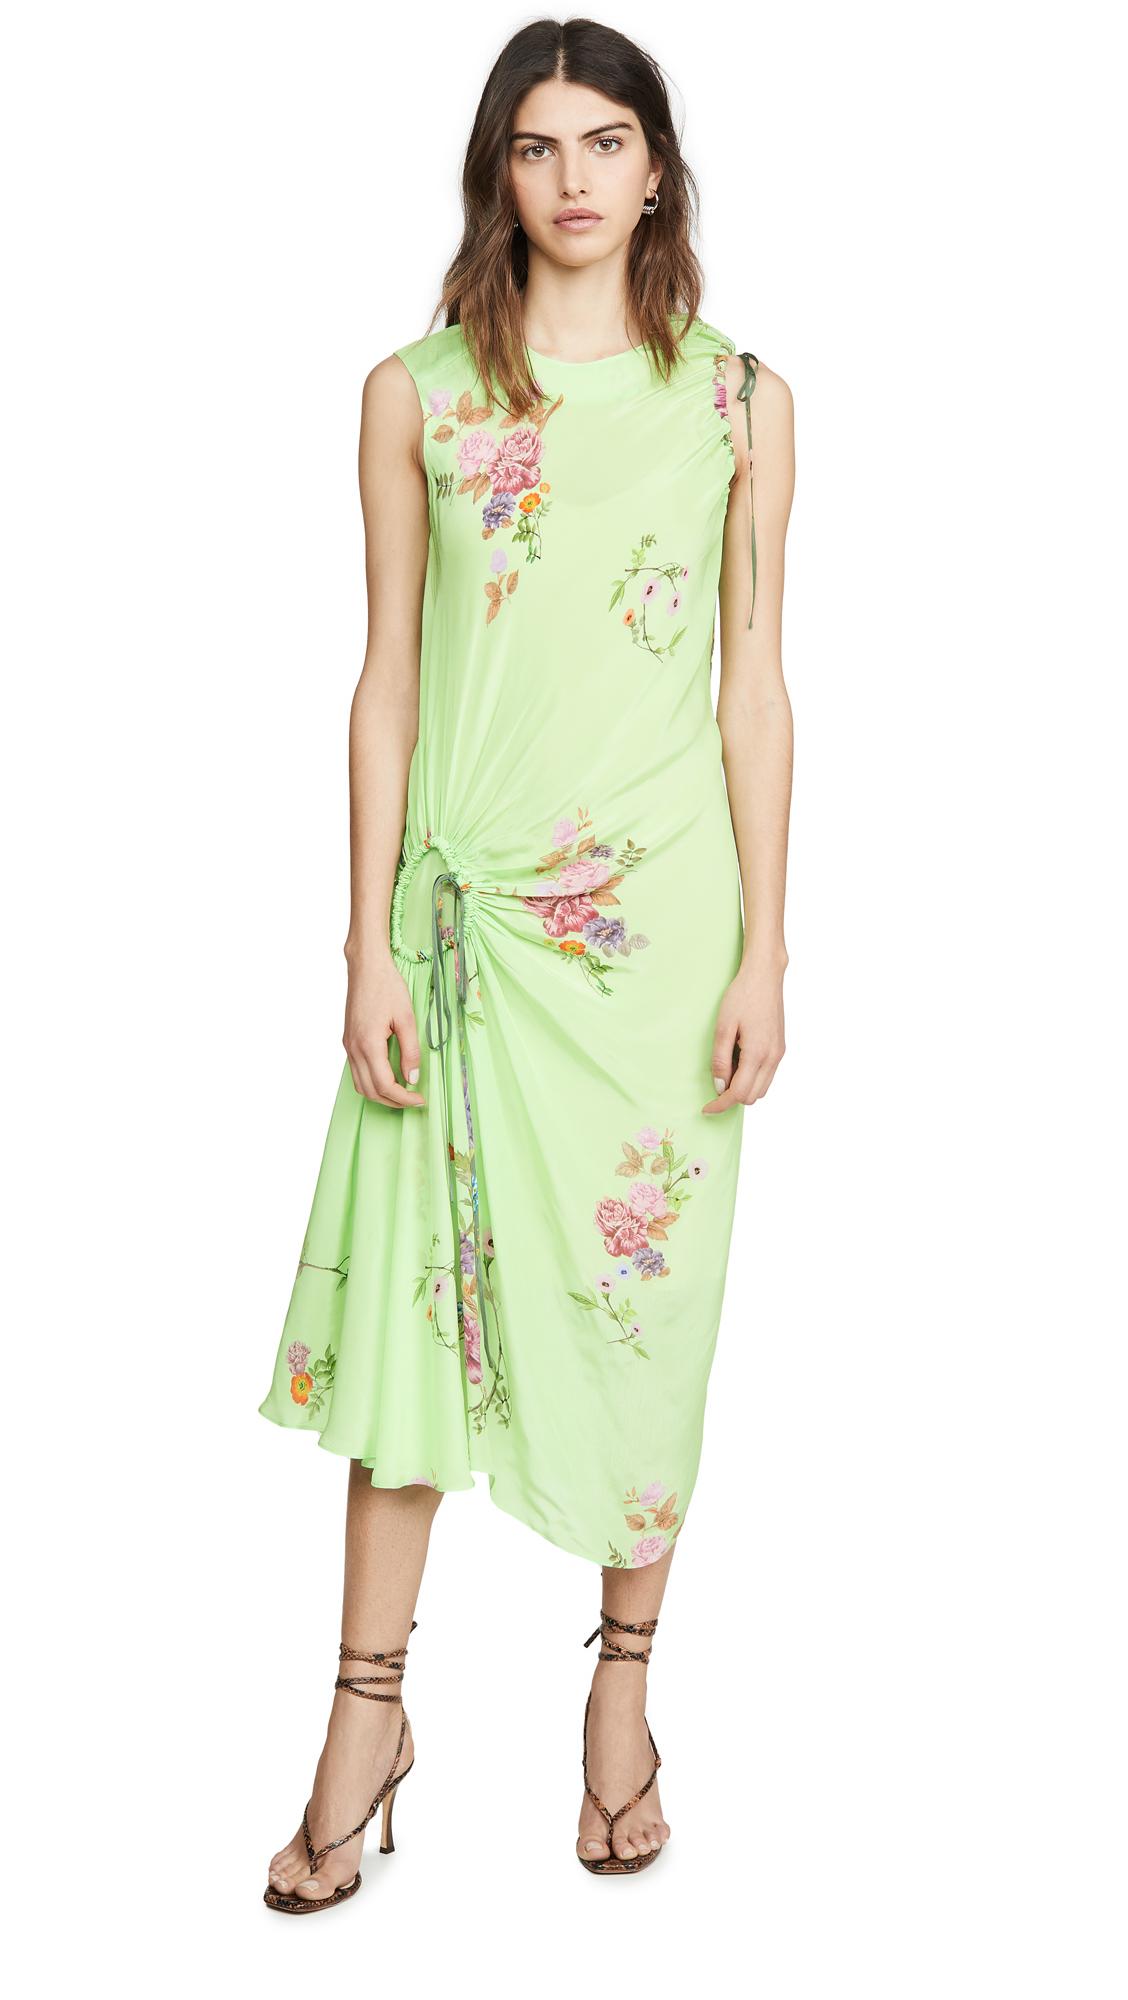 Preen By Thornton Bregazzi Preen Line Aida Dress